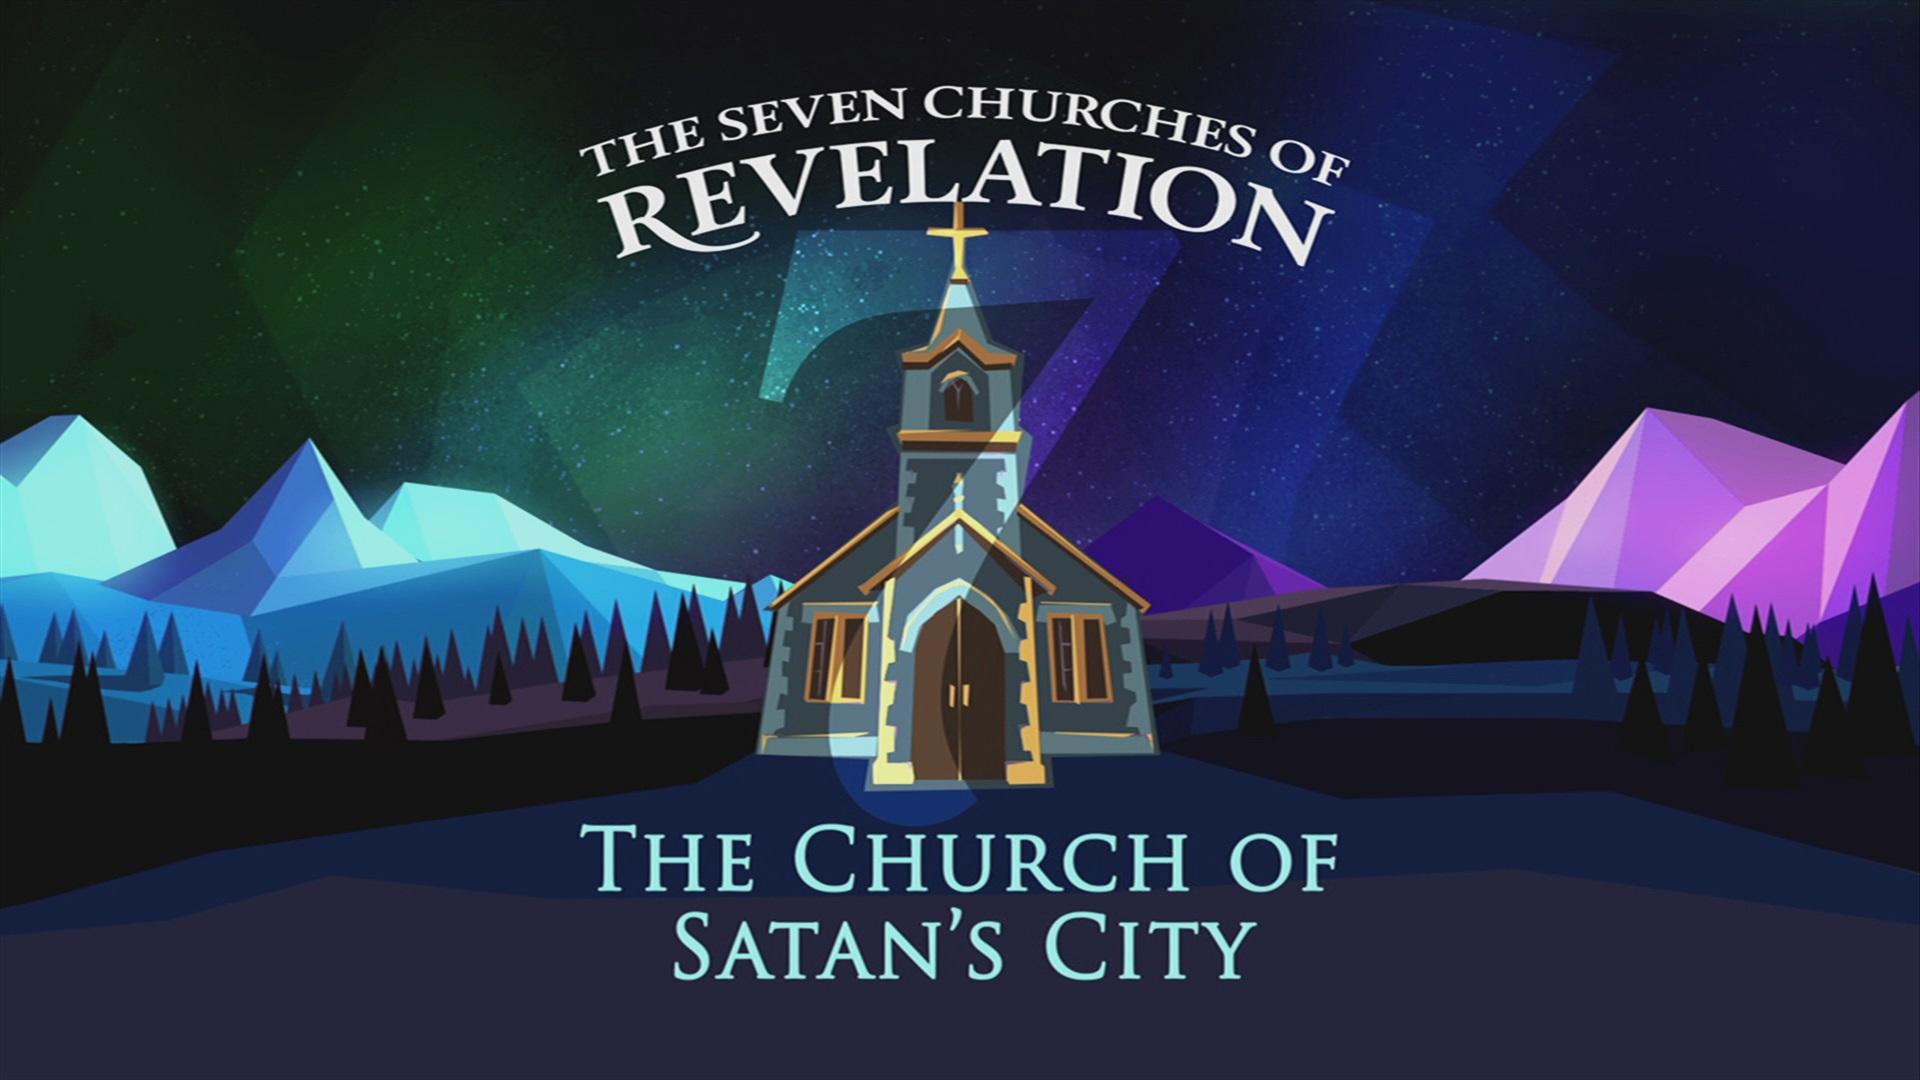 The Church of Satan's City